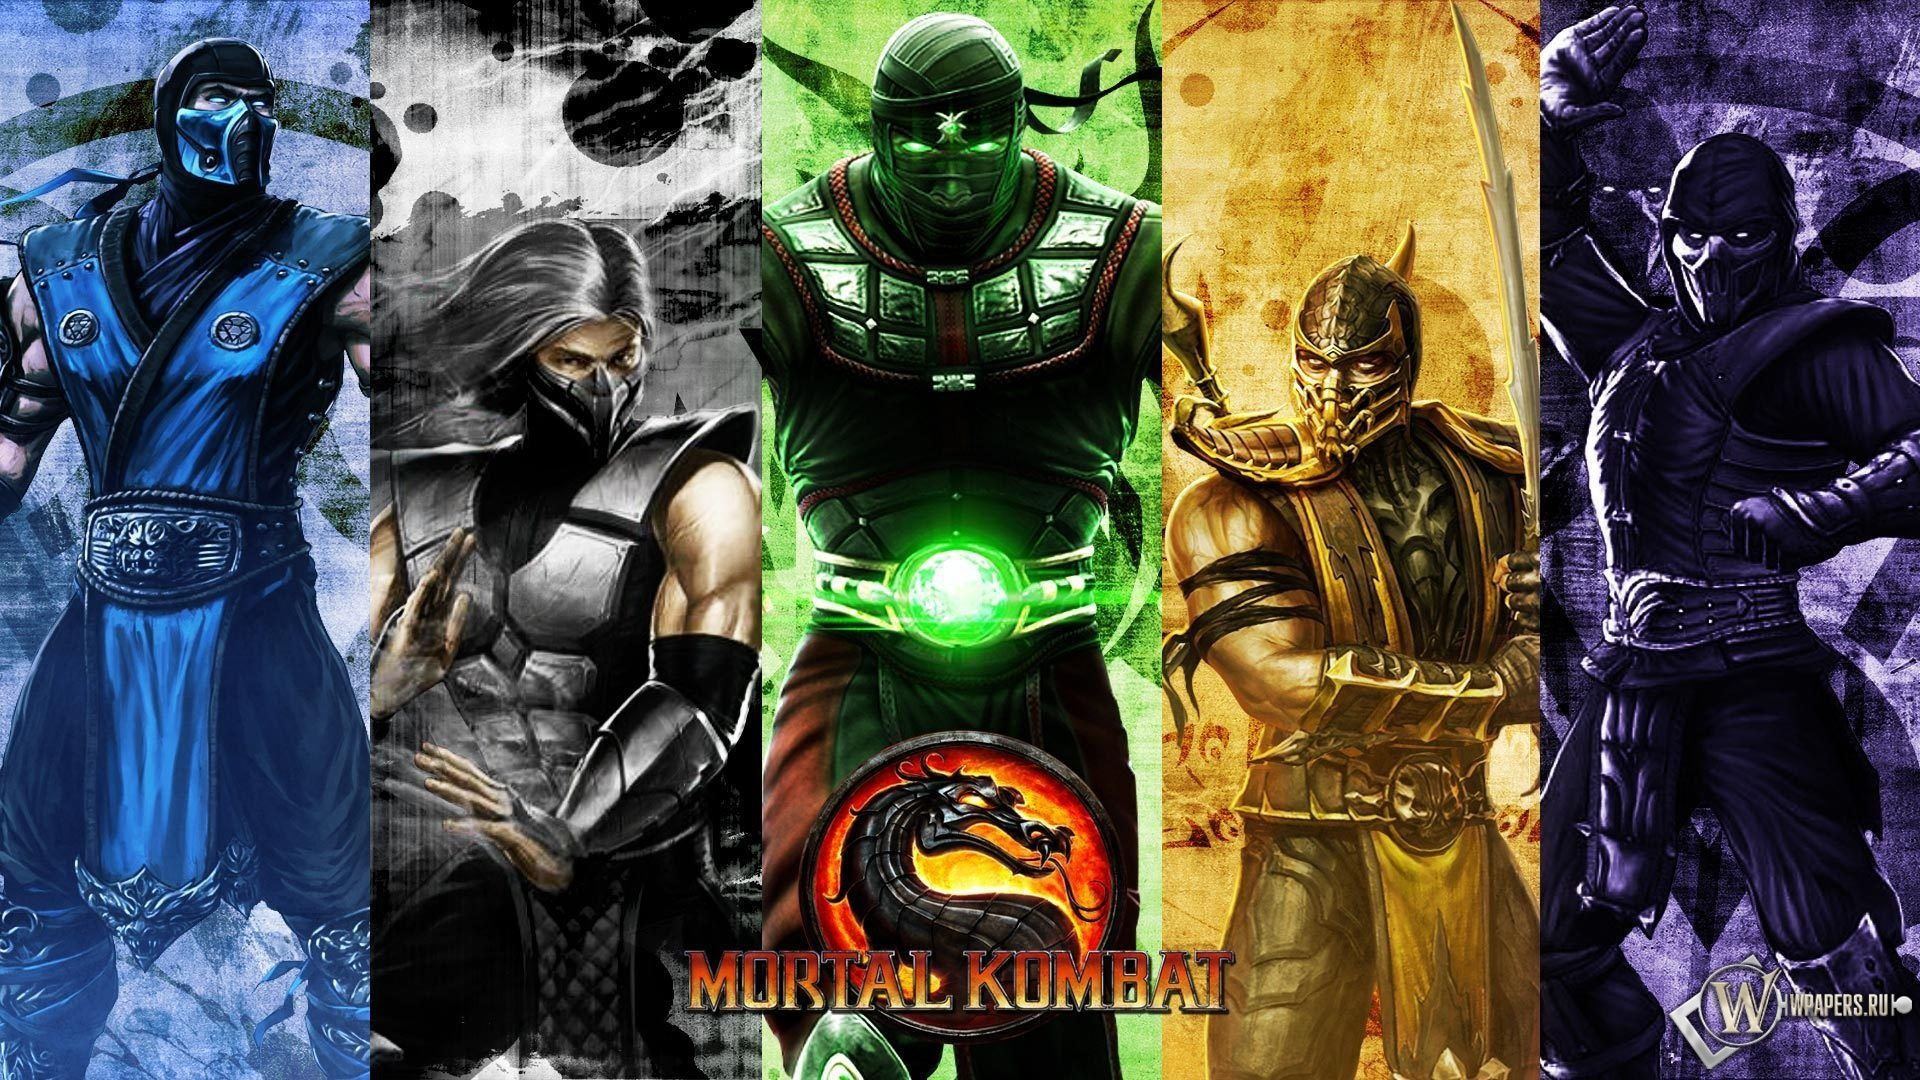 Morda combat mortal kombat wallpaper free download pc 4892 video games morda combat mortal kombat wallpaper voltagebd Images